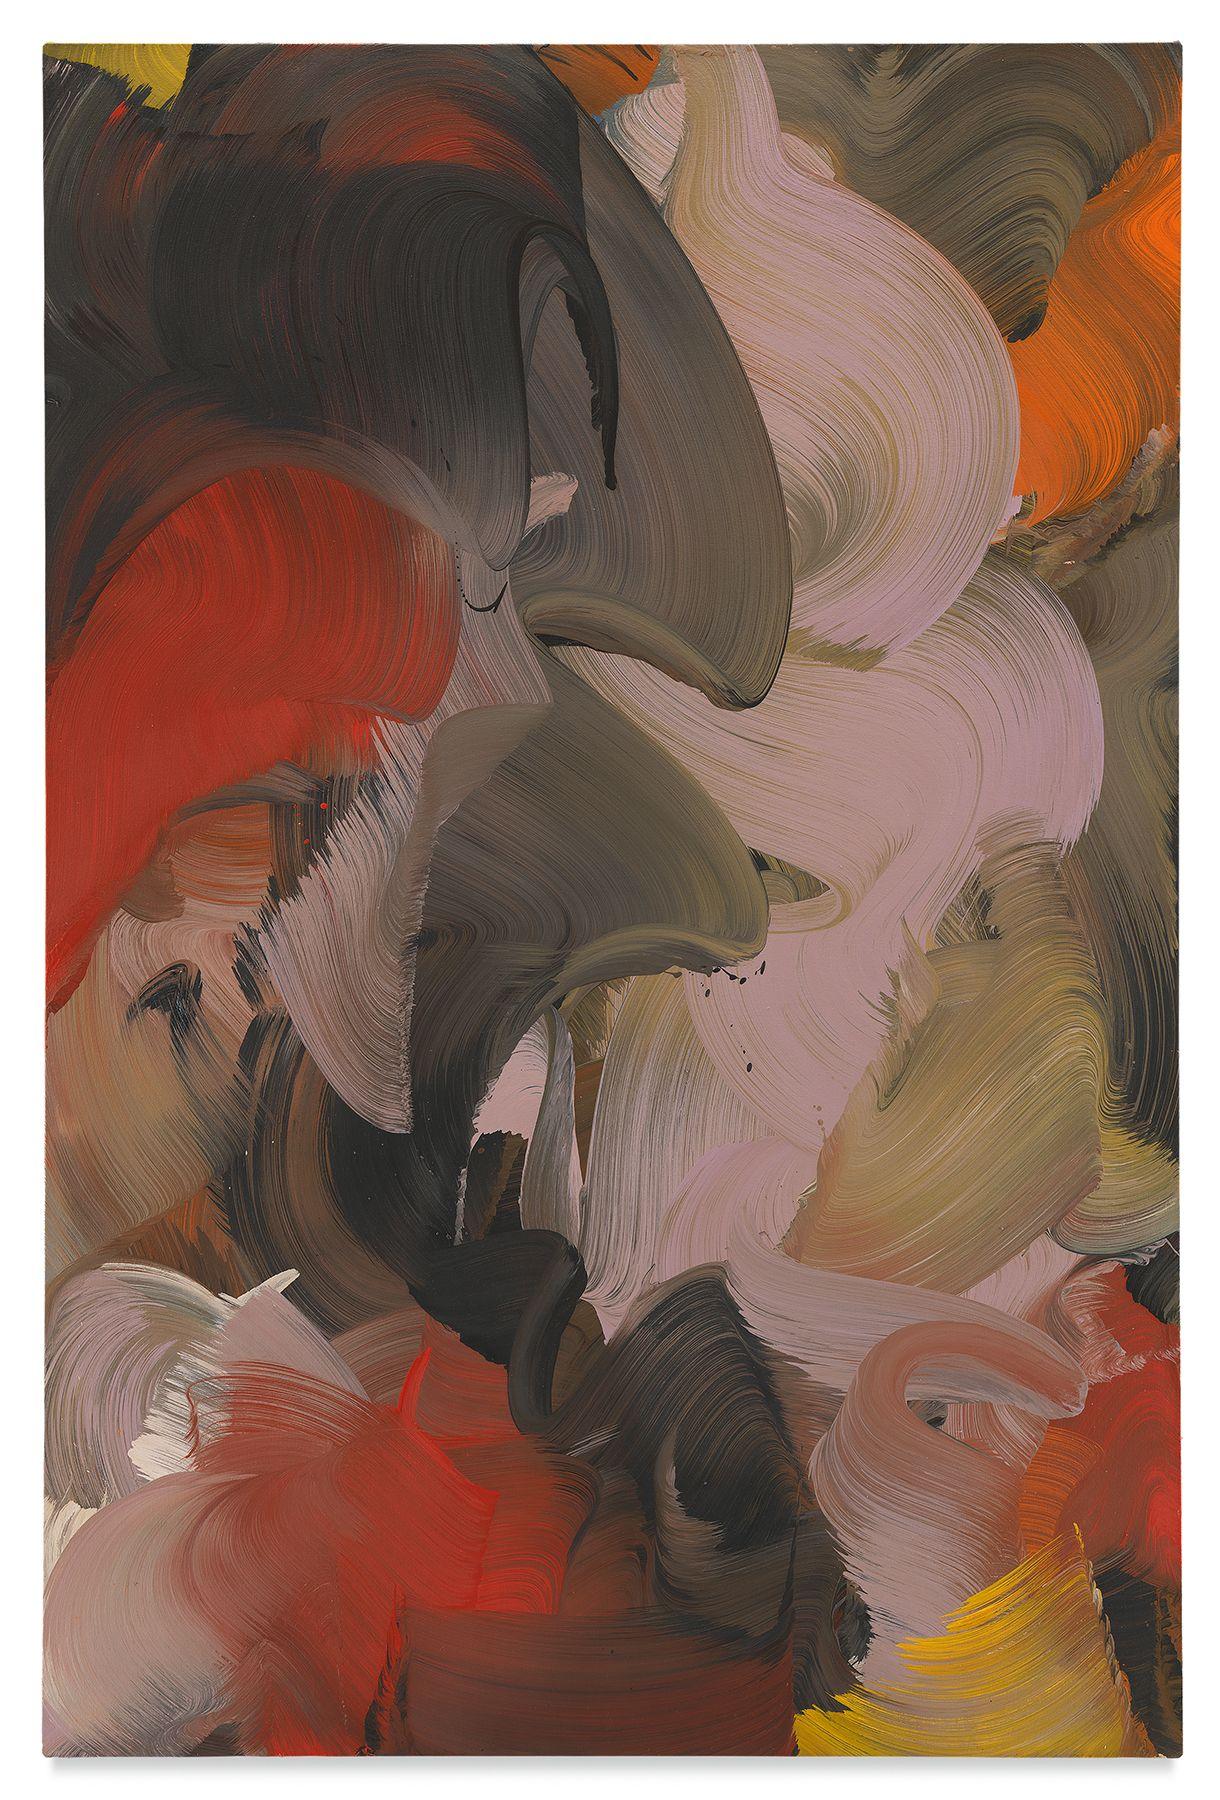 fox's bride,2018,Oil on canvas,59.5 x 39.5 inches,151.1 x 100.3 cm,MMG#30260